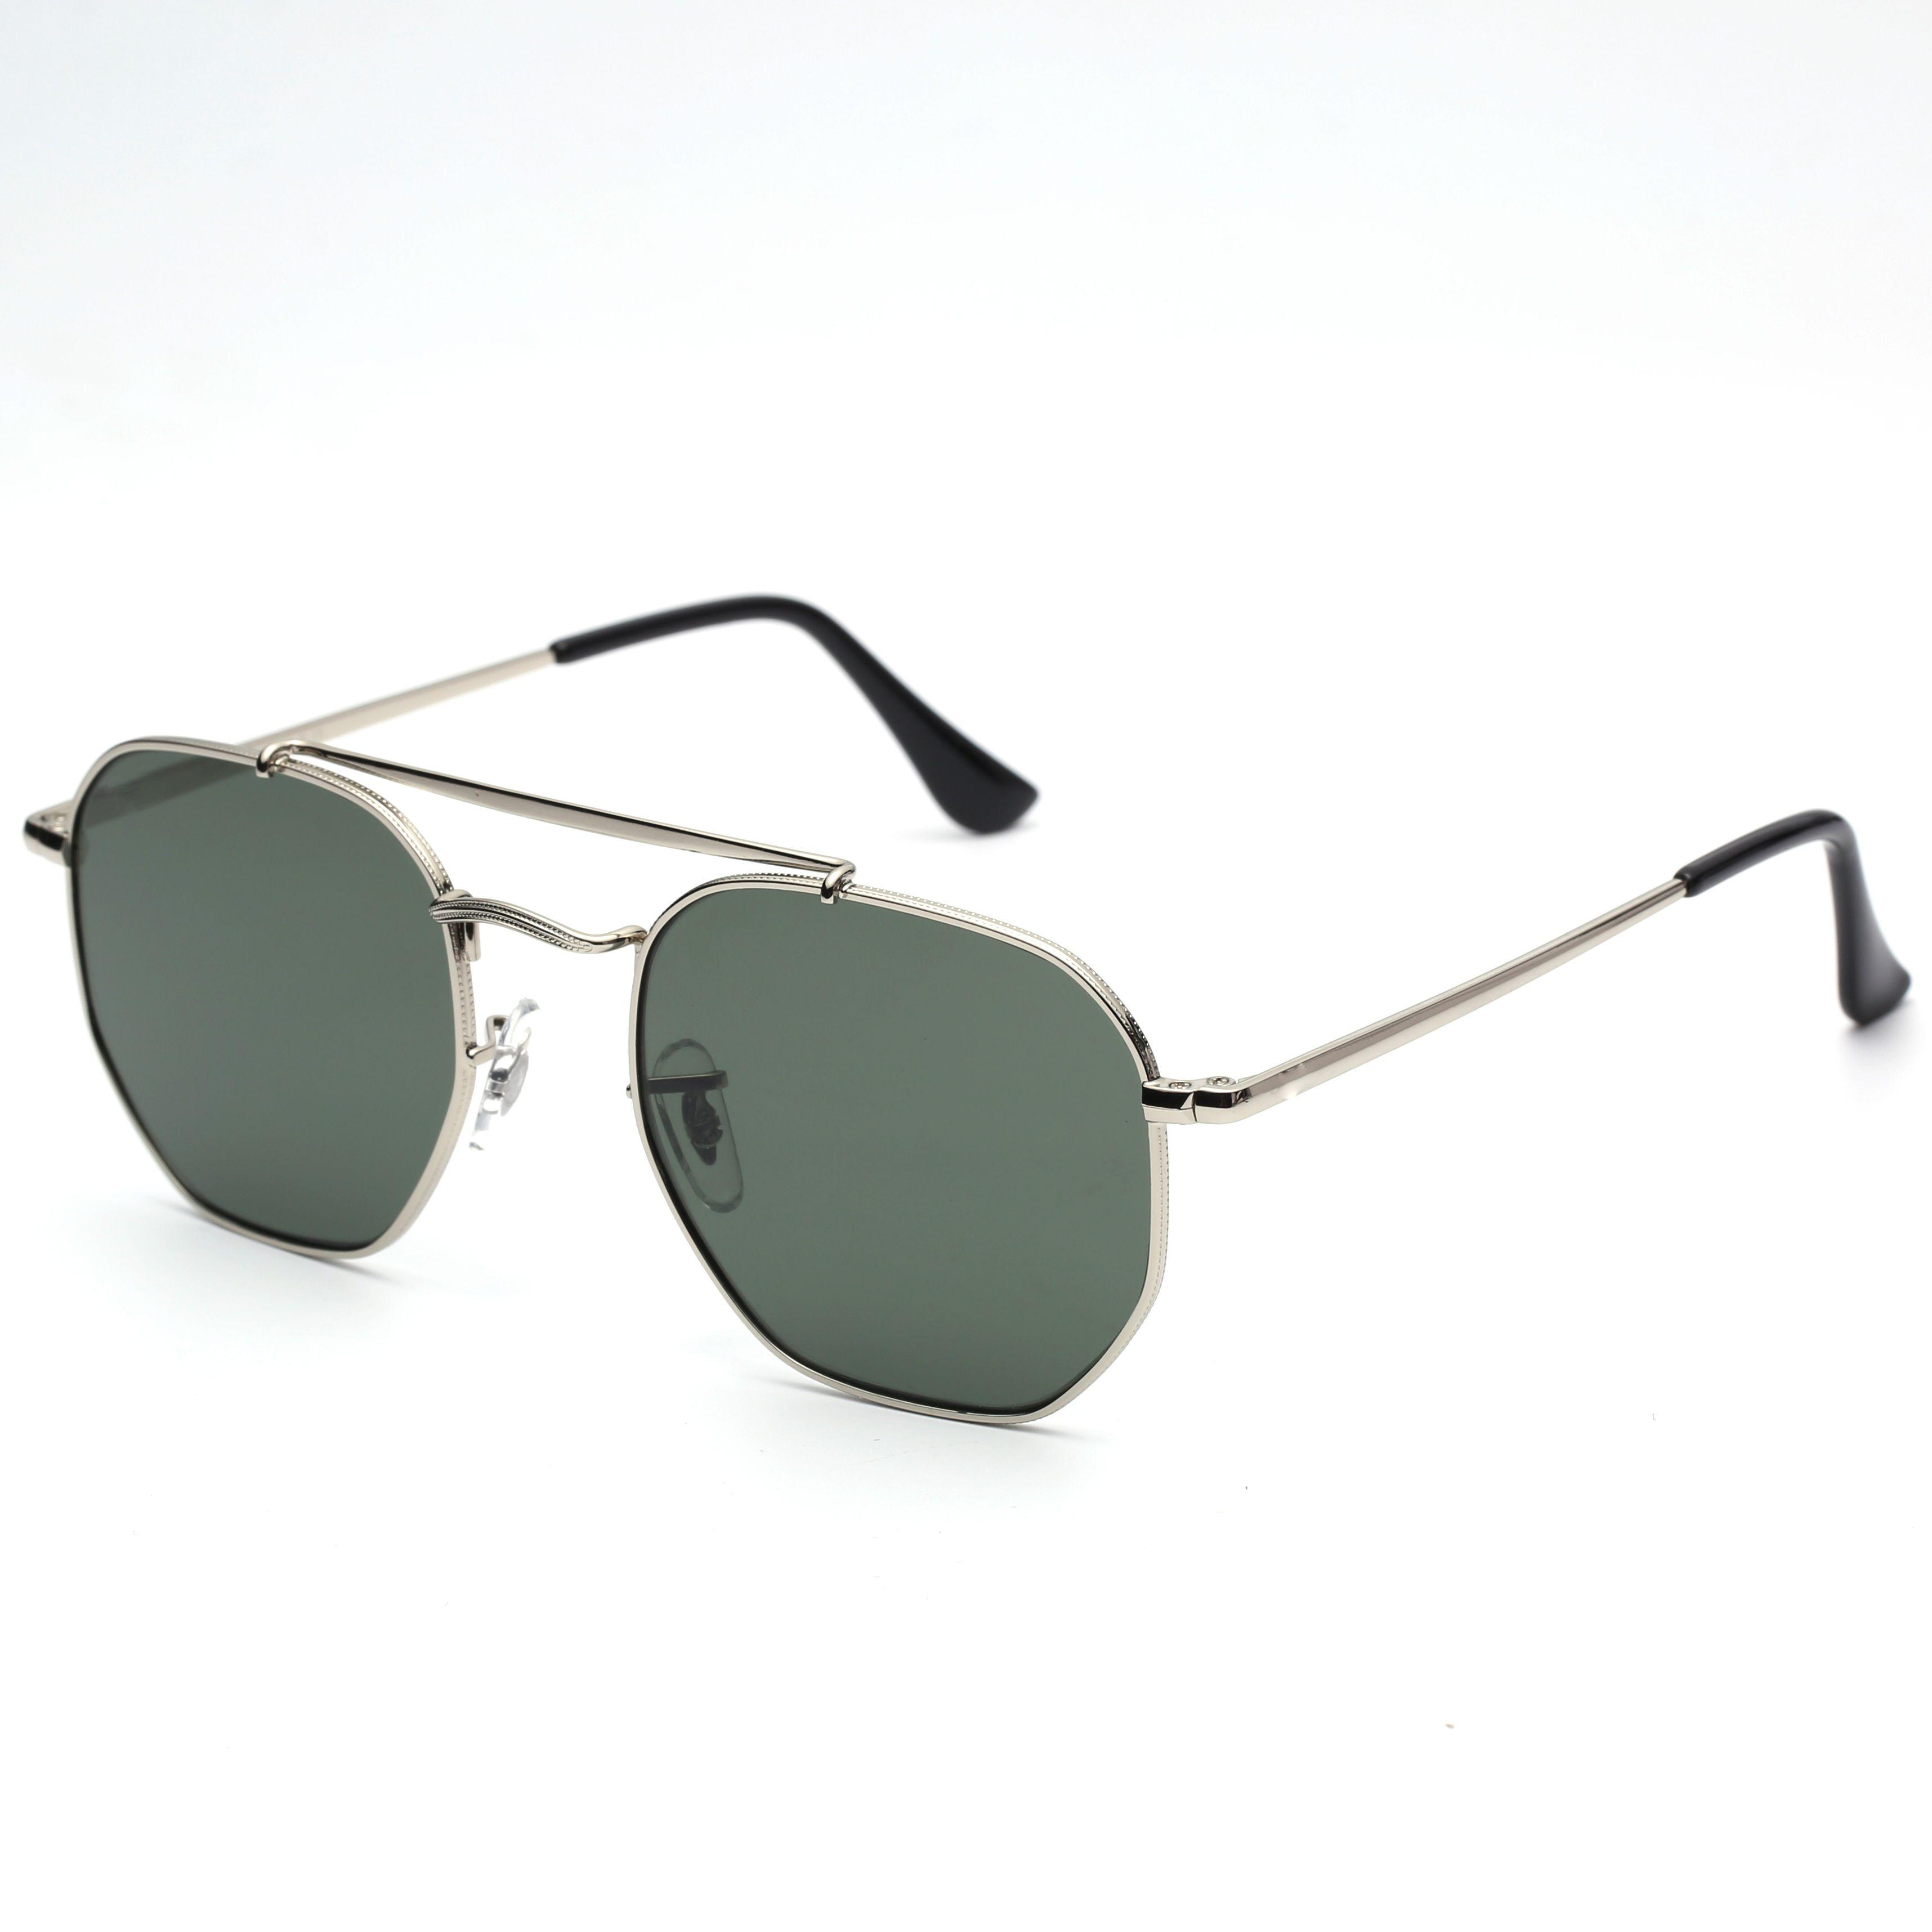 Wholesale-2018 Hexagonal Sunglasses G15 glass lense general sun glasses shades UV400 men women sunglasses glasses with all original packages